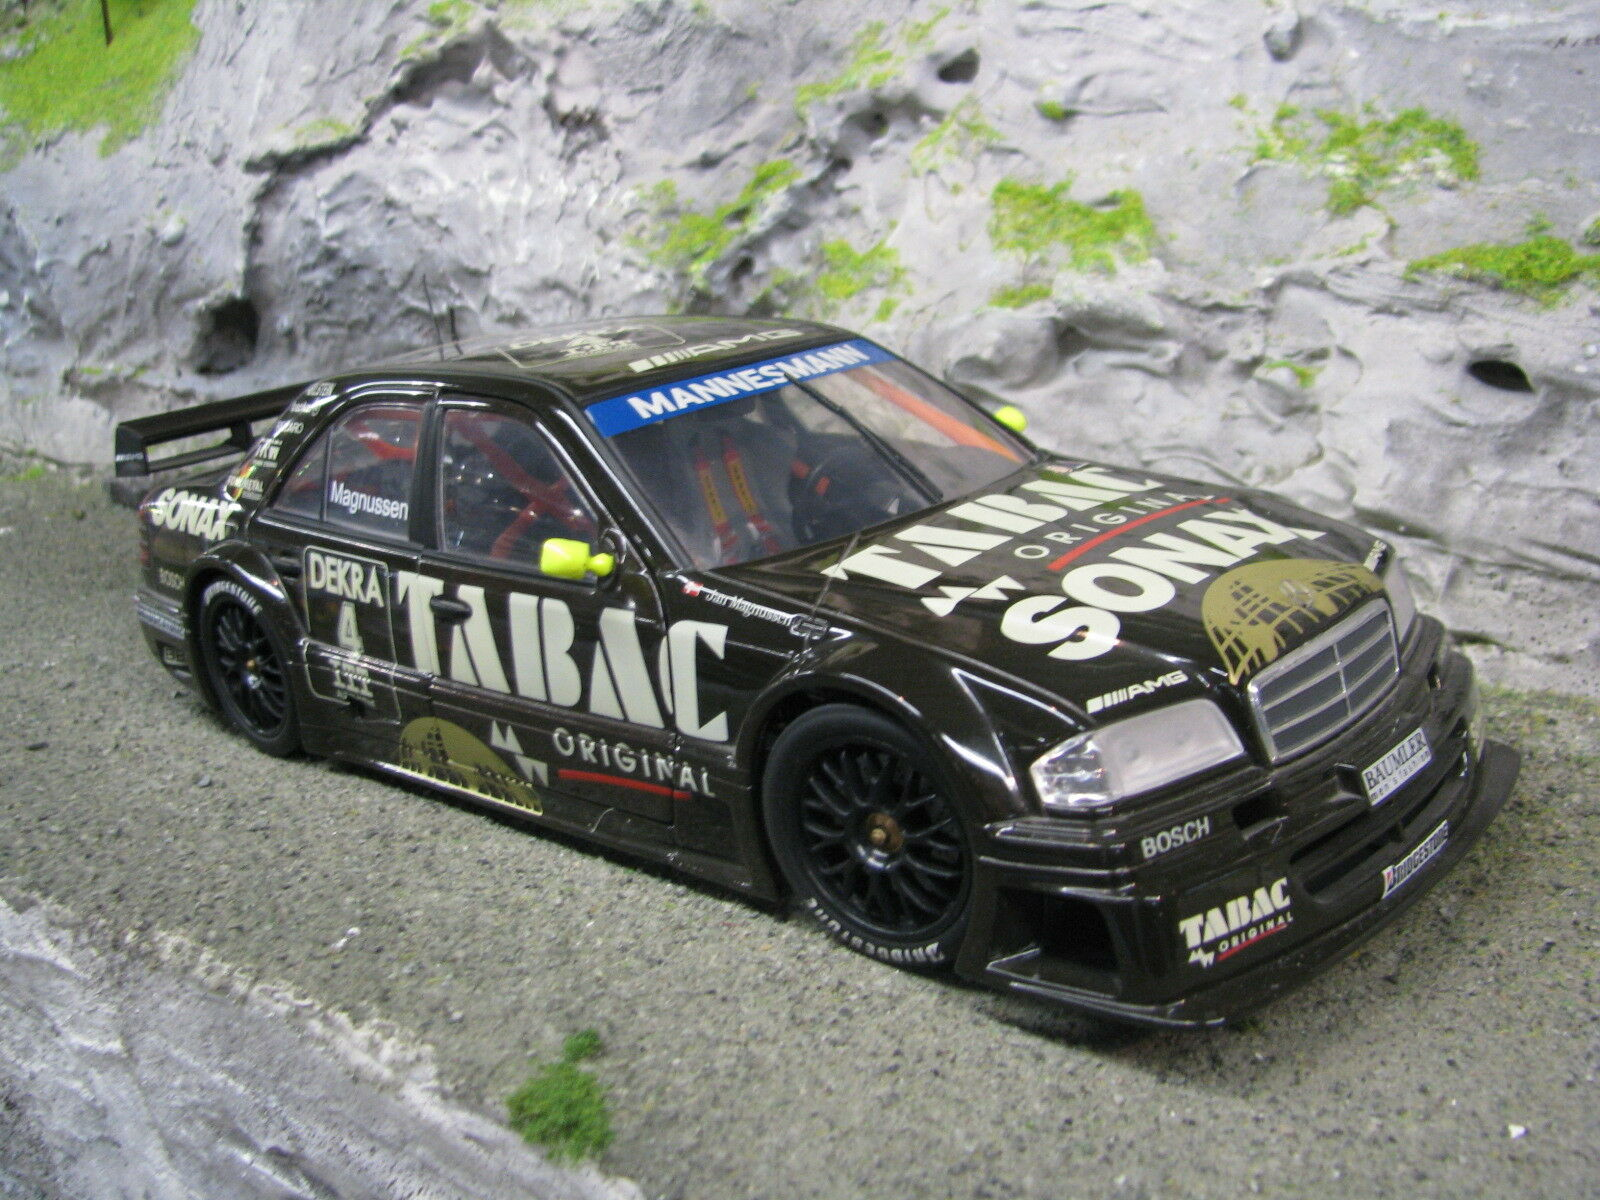 UT Models Mercedes-Benz C-Class DTM 1995 1 18  4 Jan Magnussen (DEN) (MBC)